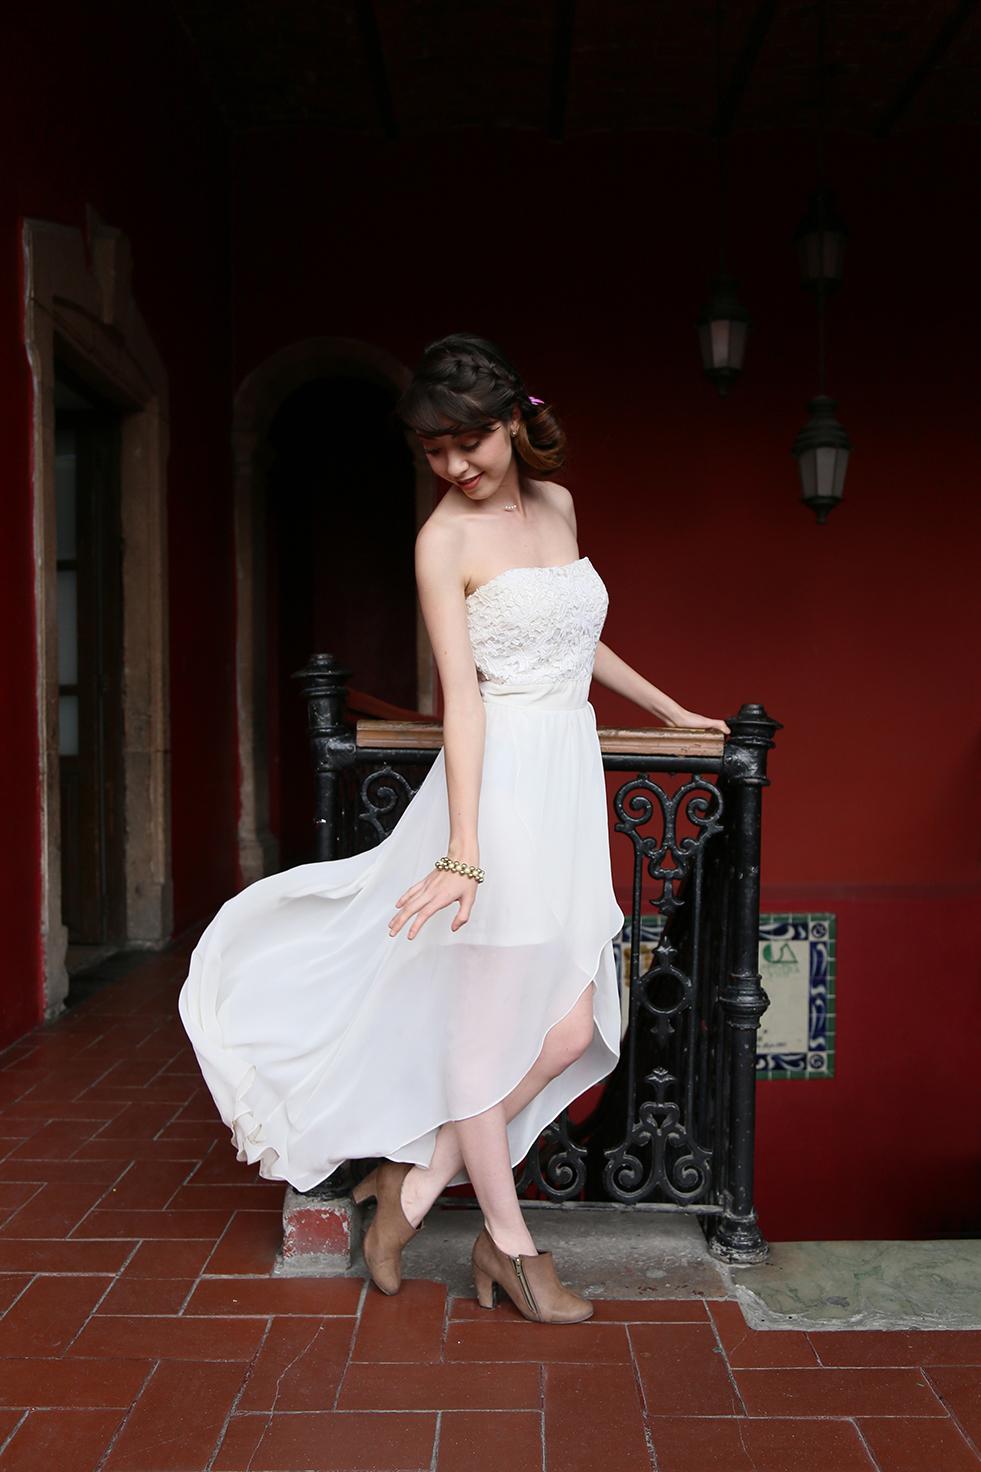 Maroge-Angela-Velazquez-fotografia-sesiones-diseño-16